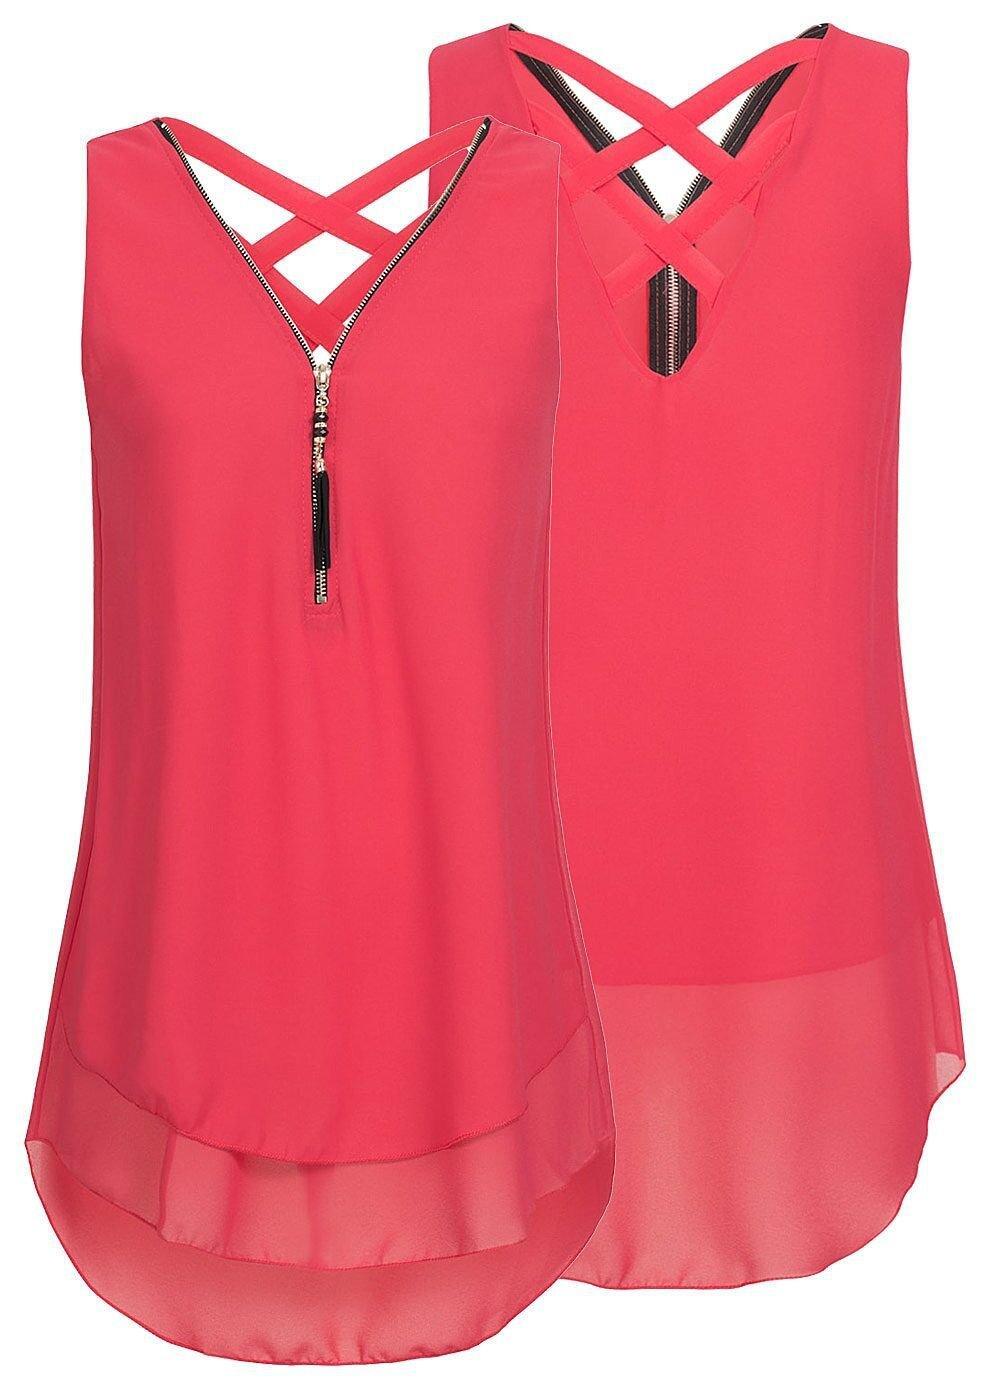 Yknktstc Womens Casual Sleeveless V Neck Chiffon Tank Top Crisscross Back Zipper Blouse T Shirt Small Style 2-Red